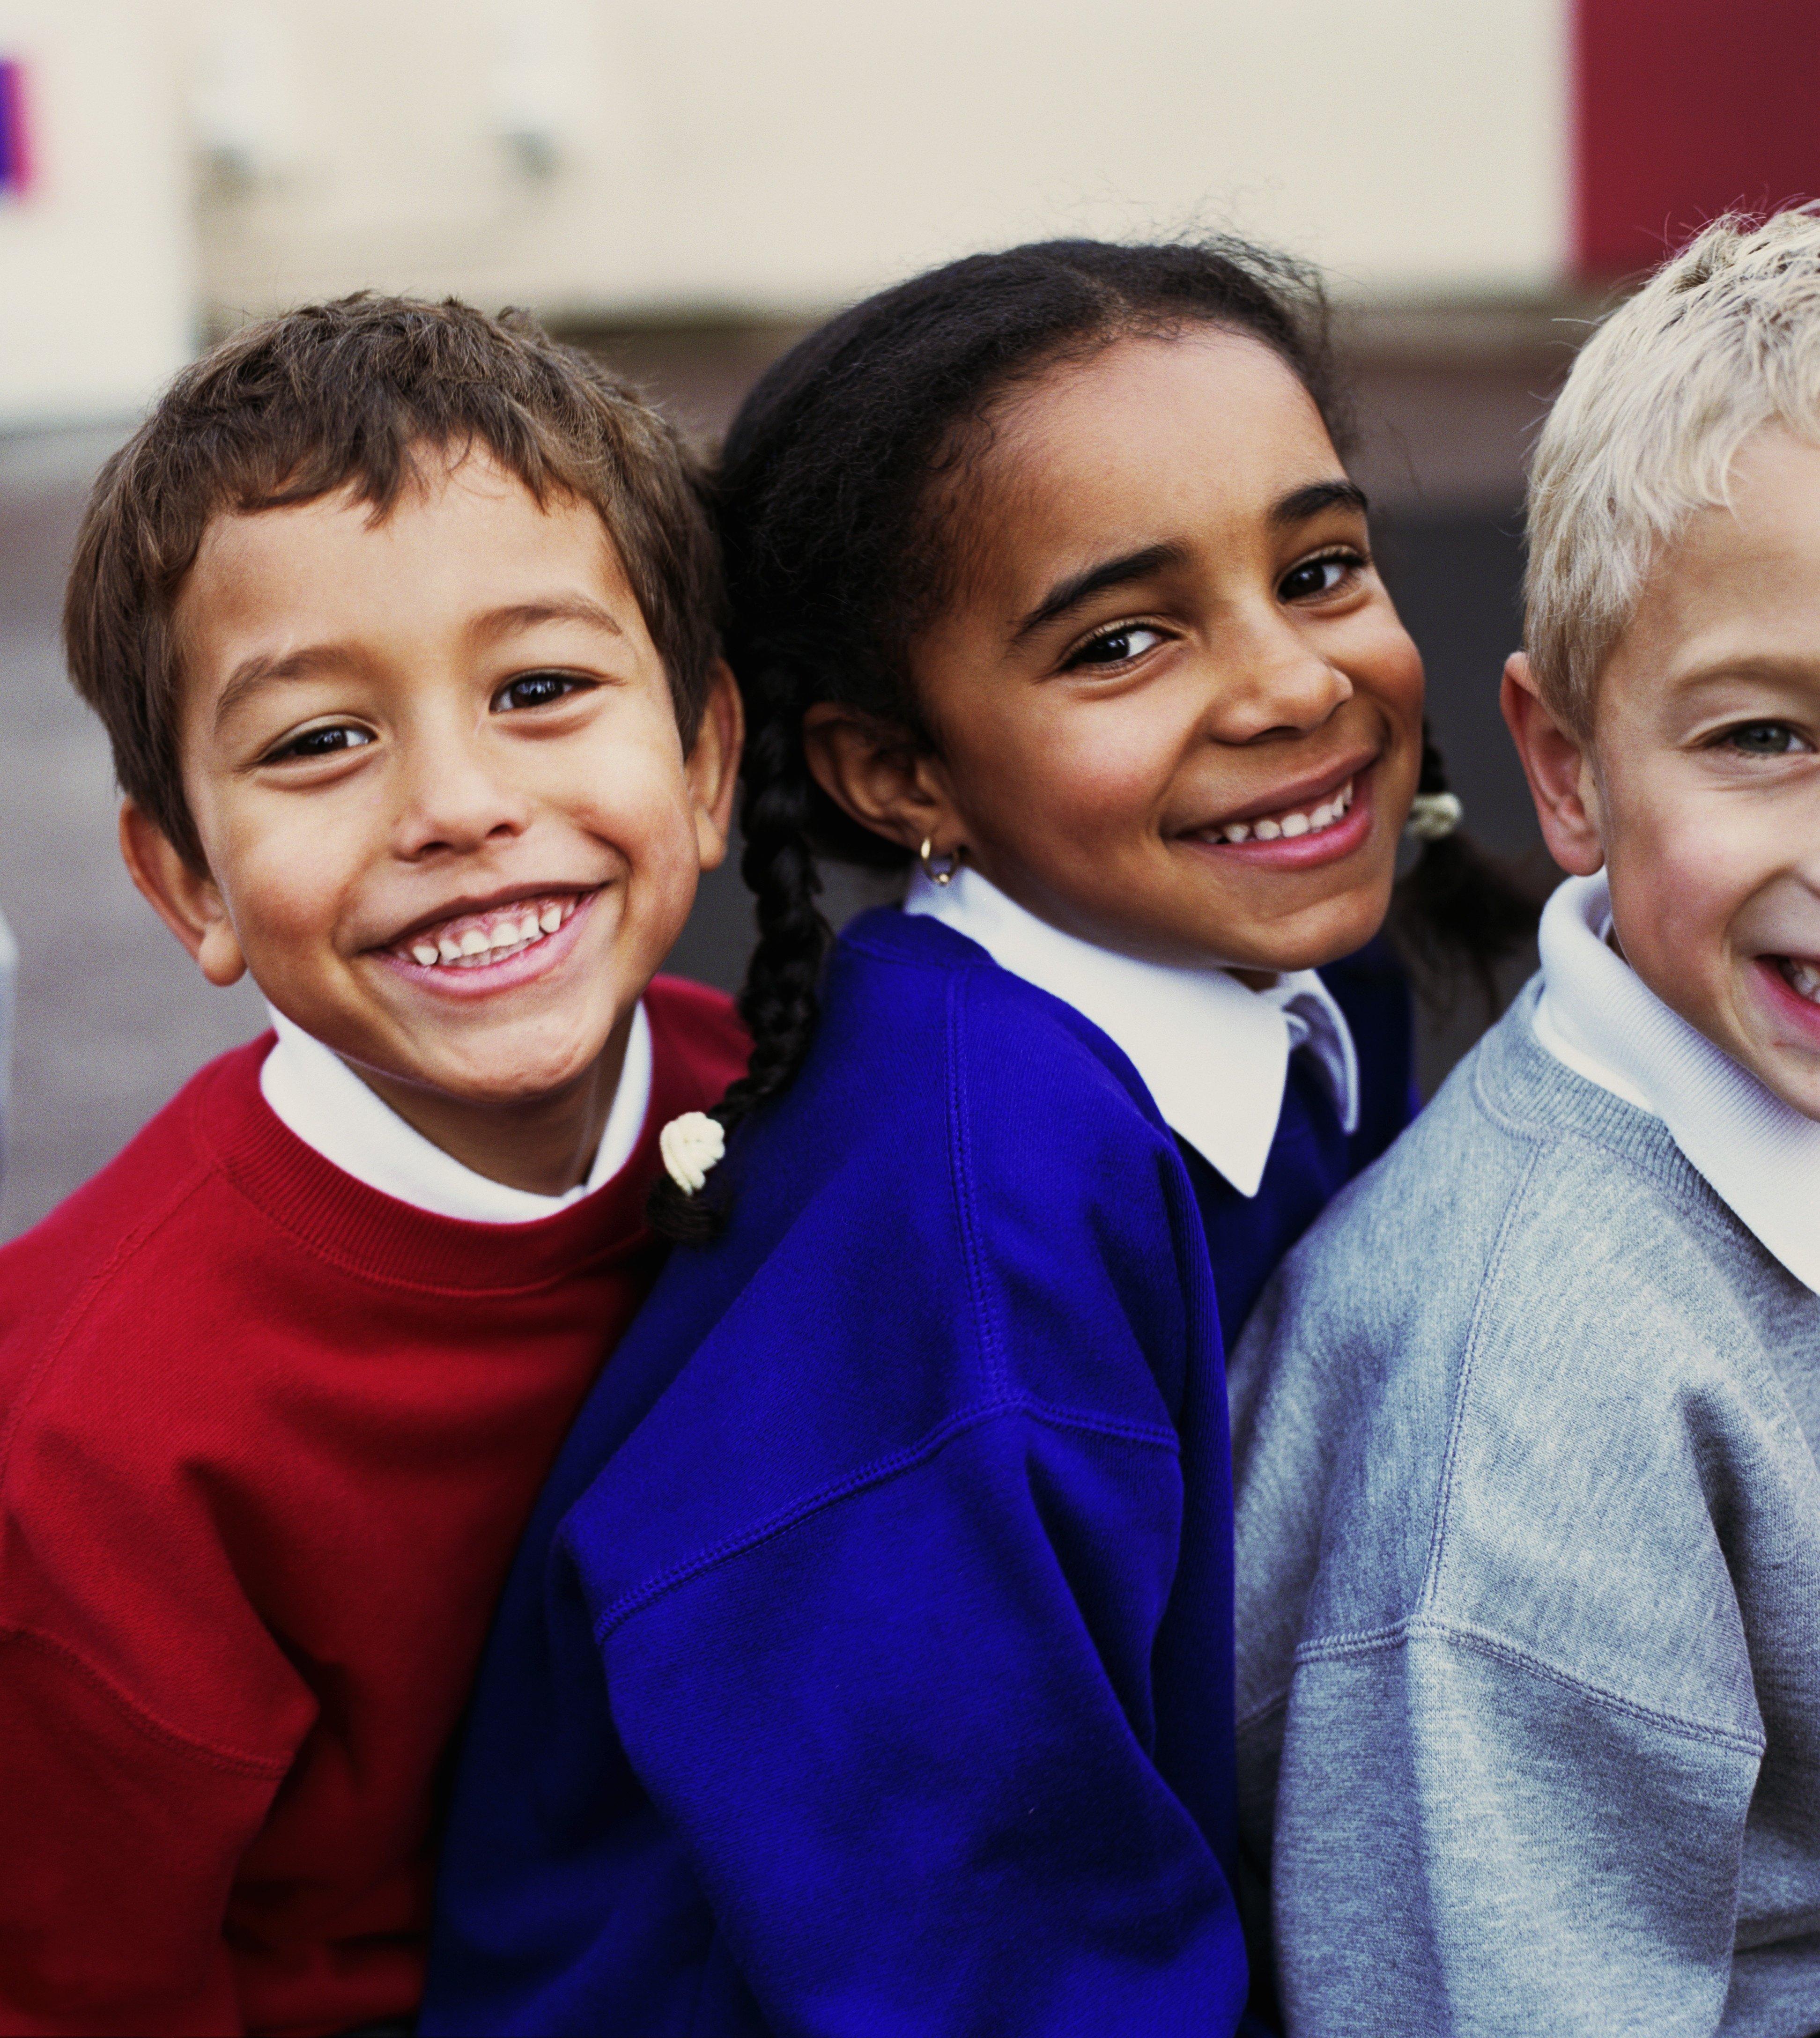 smiling-students.jpg